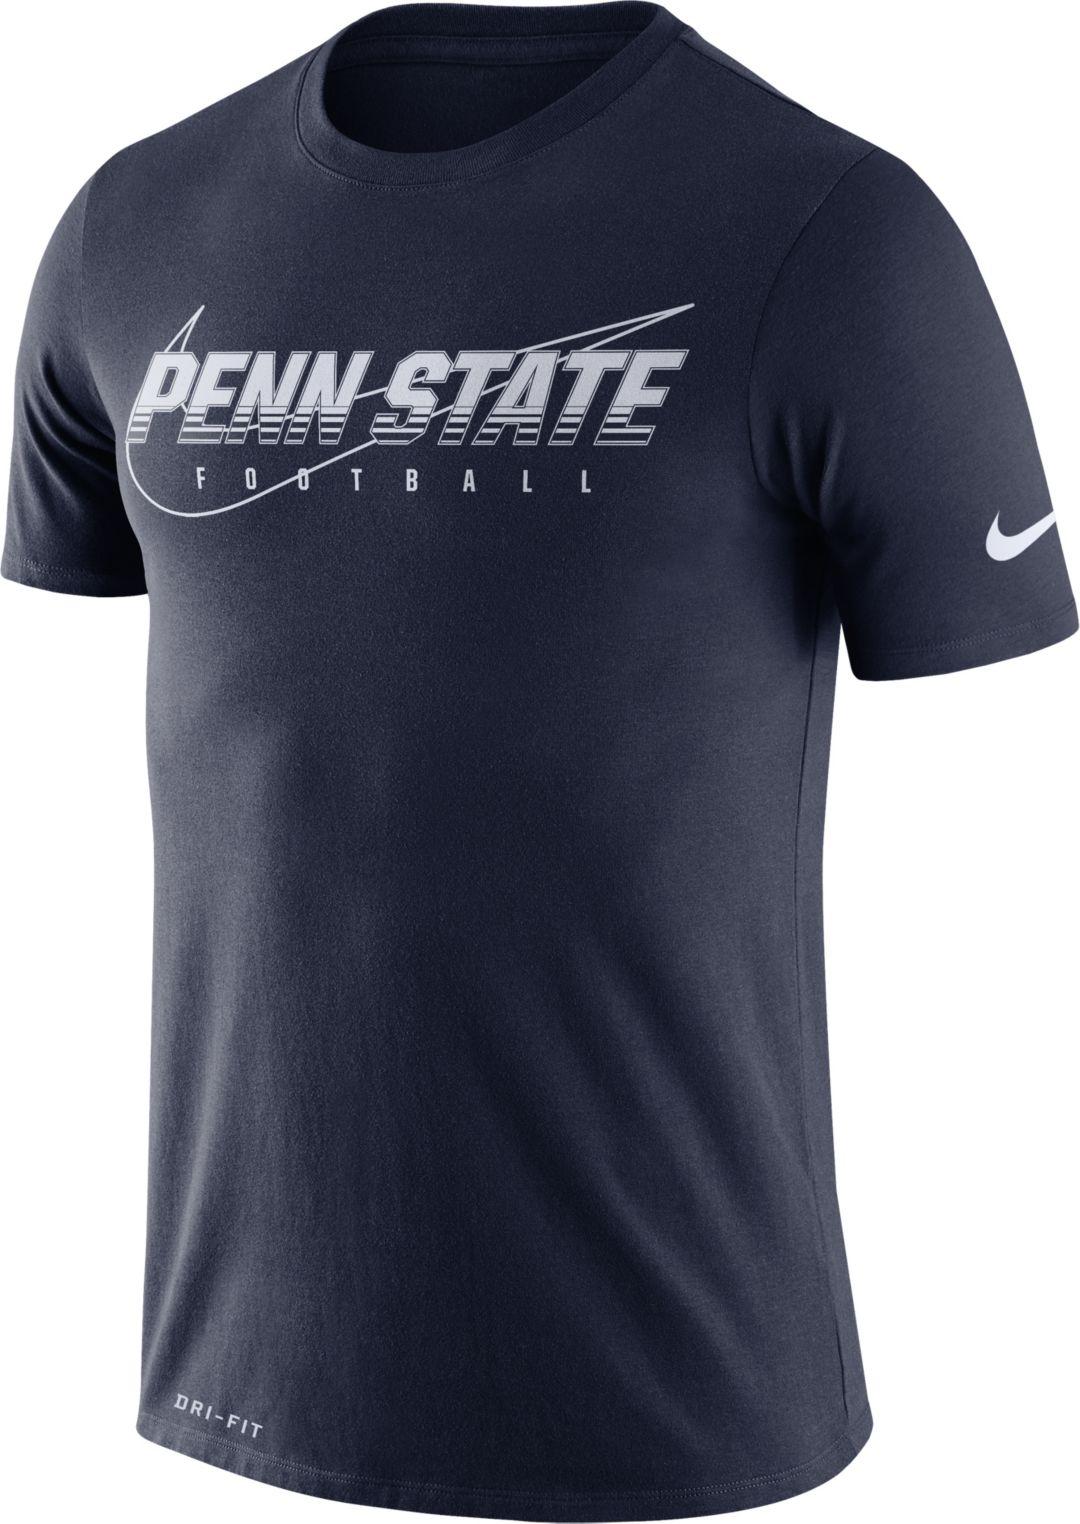 new concept ba673 e367c Nike Men's Penn State Nittany Lions Blue Football Dri-FIT Cotton Facility  T-Shirt